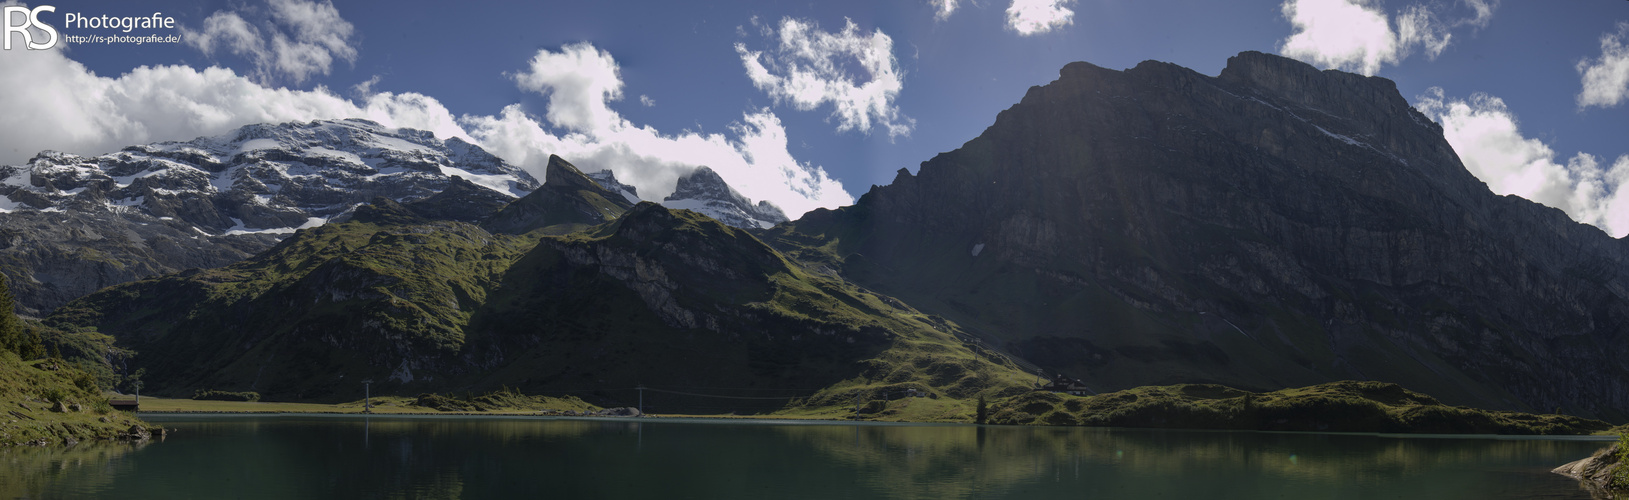 Trübsee - Engelberg - Schweiz